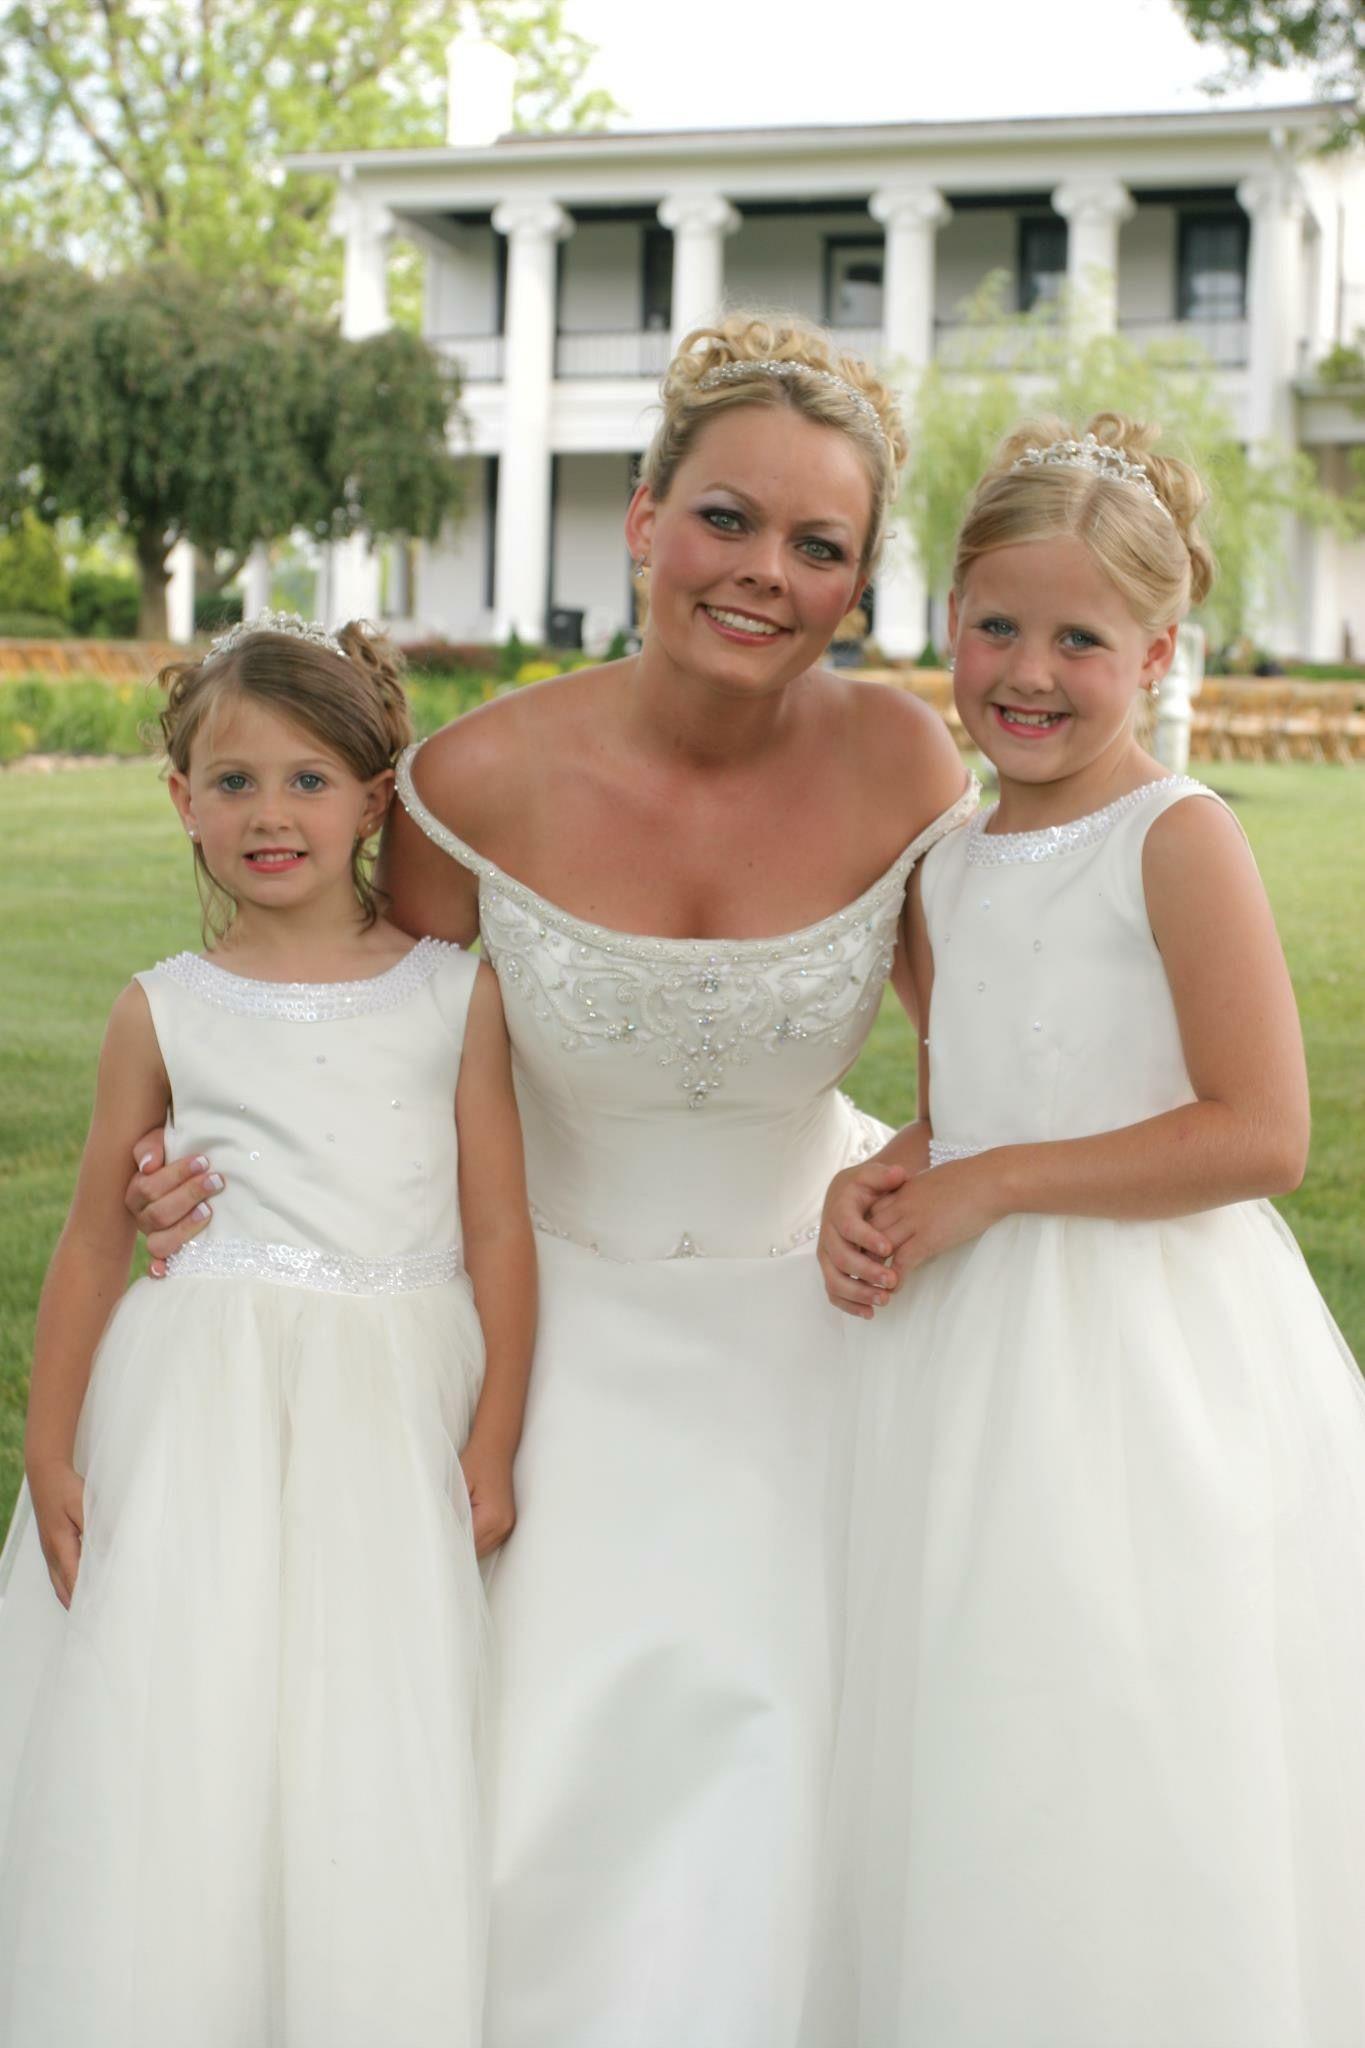 Pin by Loretta Lynn's Ranch on Weddings in Hurricane Mills